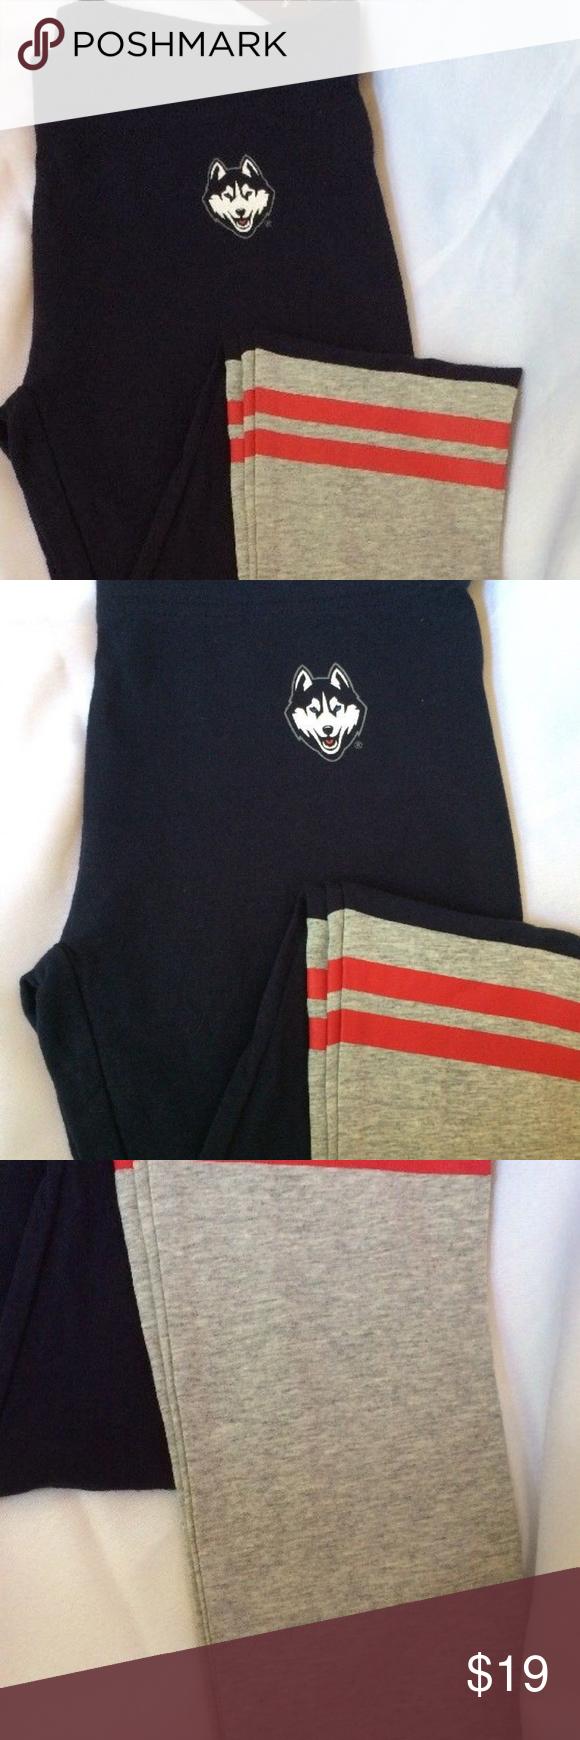 67d51a0338 UConn Huskies Yoga Pants Leggings Uconn Fan Gear! UConn Huskies Colosseum womens  Yoga pants leggings Sexy Soft Medium M Medium from Colosseum • Officially  ...